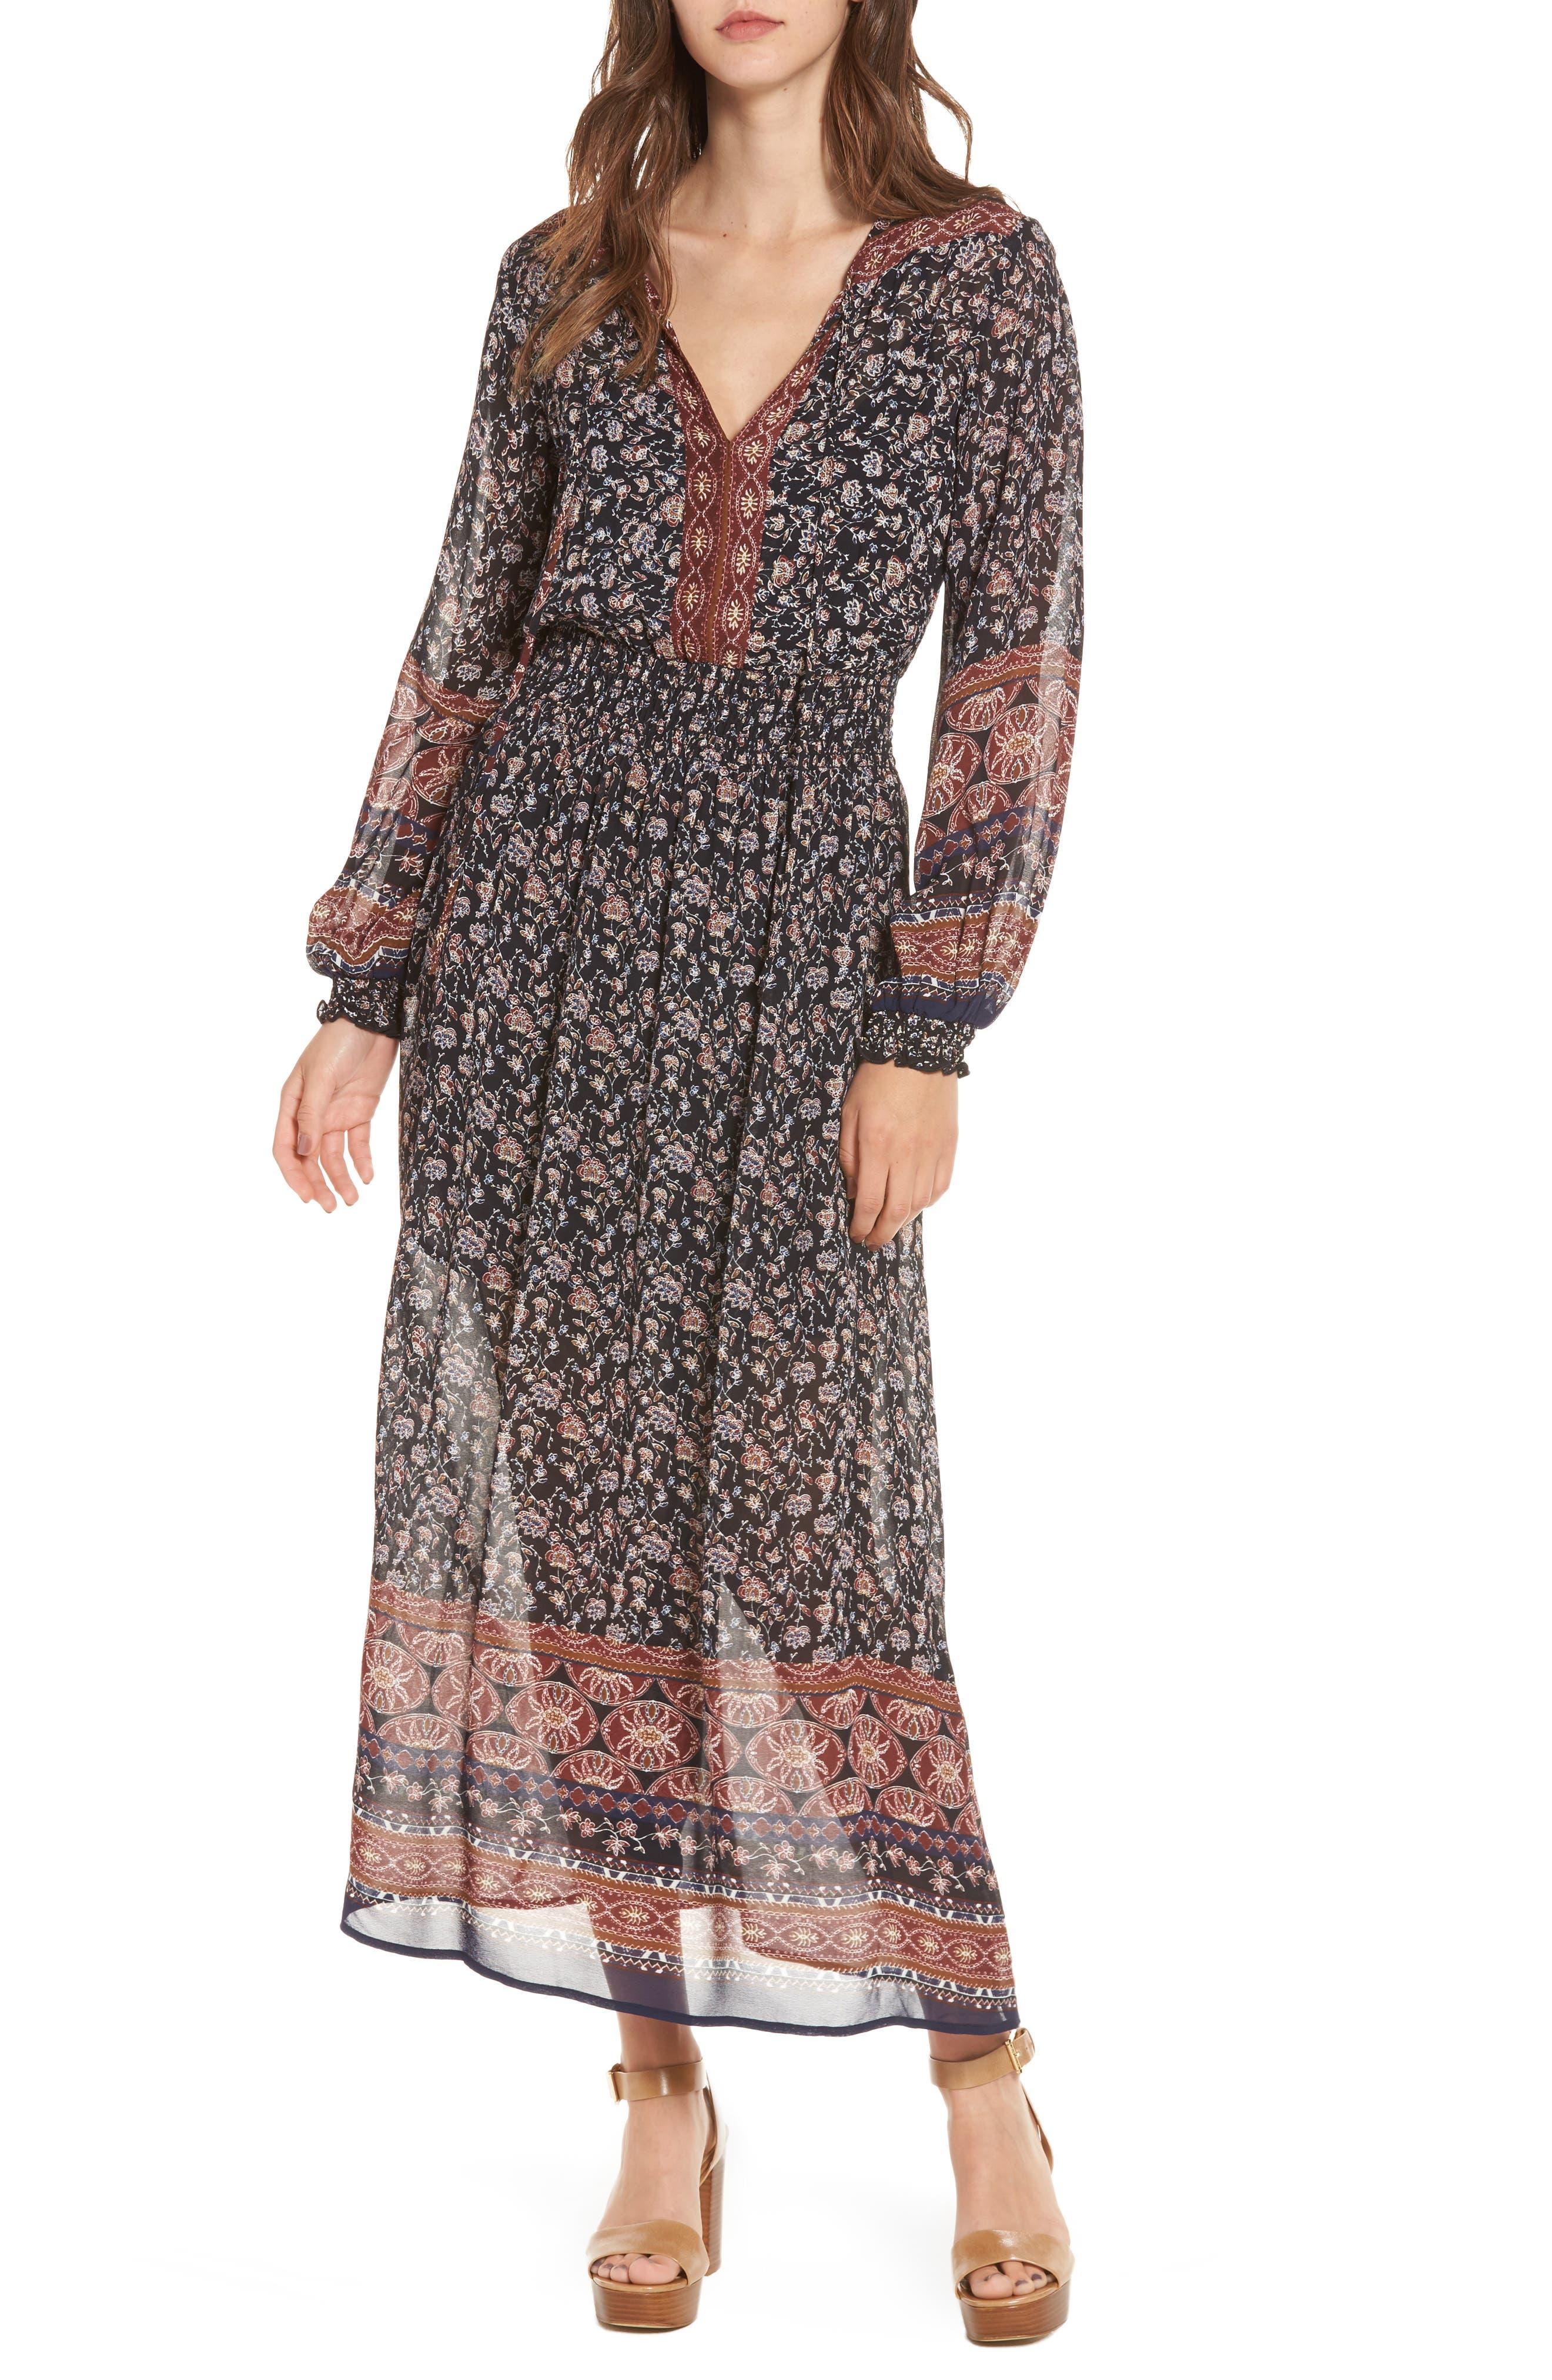 ASTR the Label Eden Dress